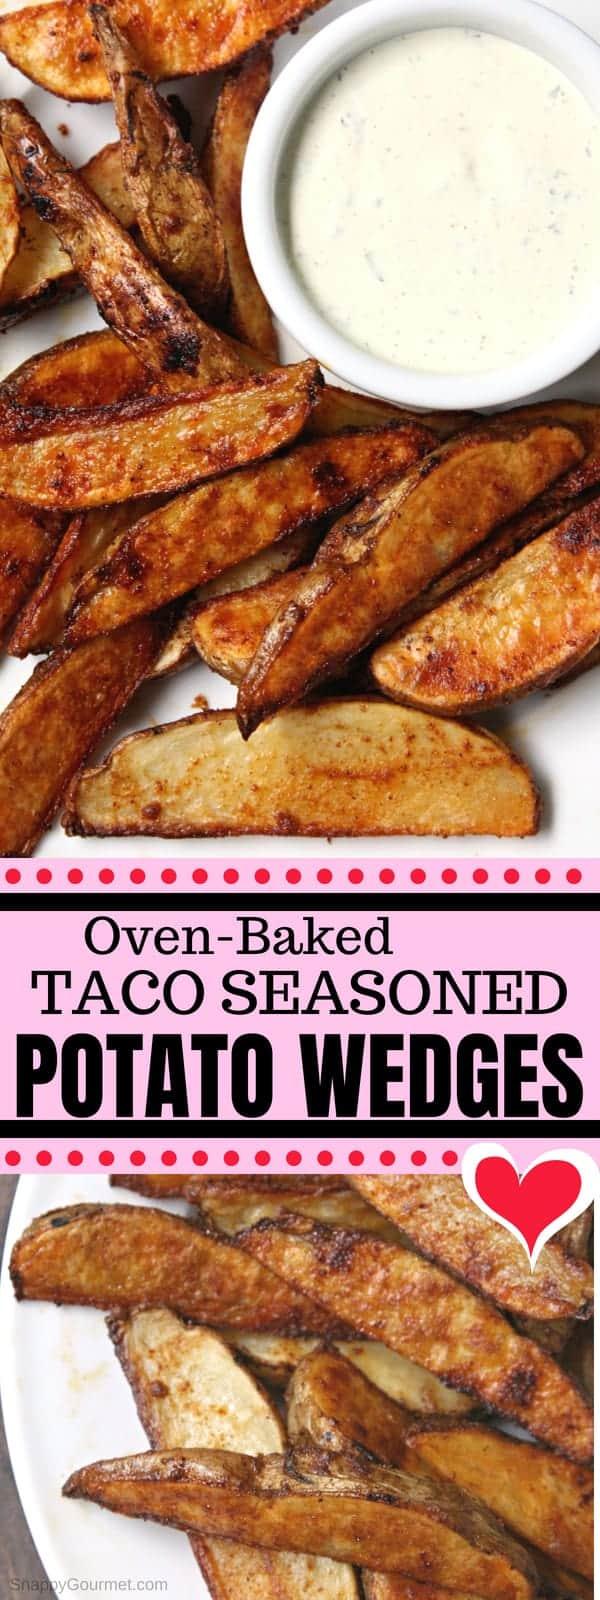 Oven Baked Potato Wedges, taco seasoned potato wedges baked in the oven until crispy! The best potato side dish! #SideDish #Potato #Recipe #SnappyGourmet #Taco #Homemade